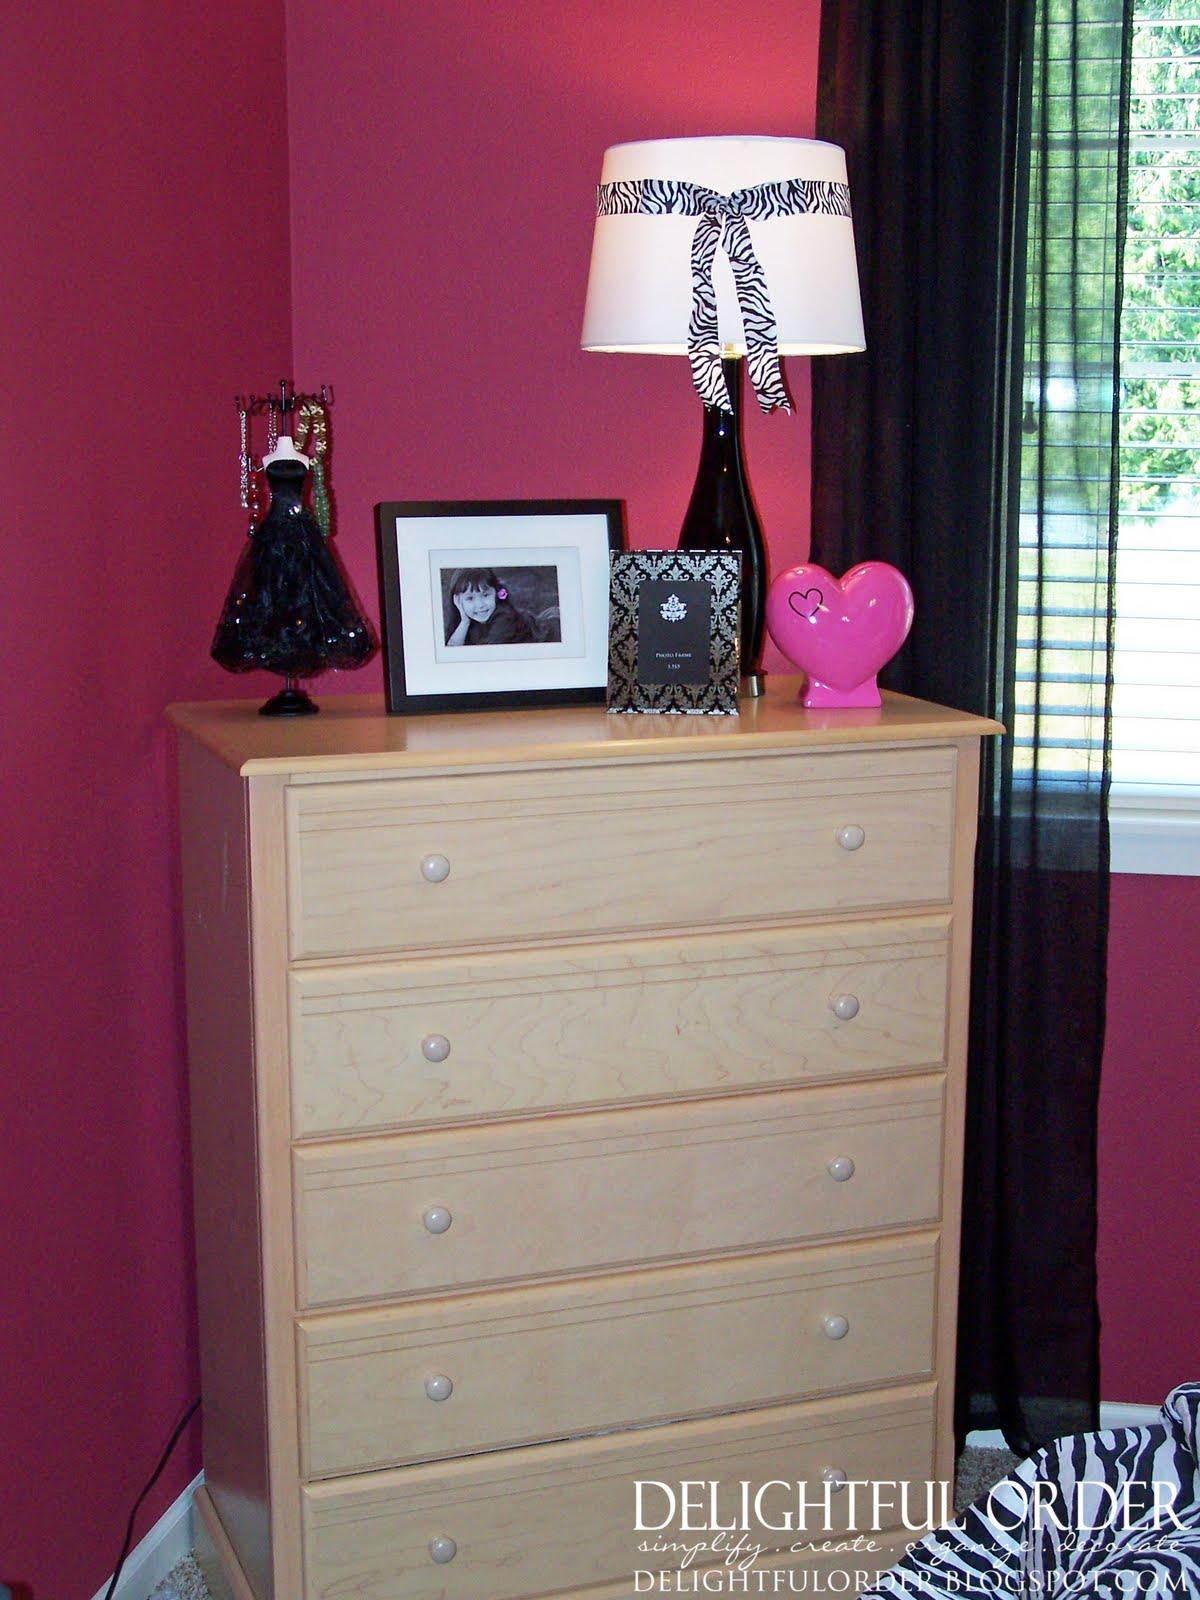 Delightful Order Hot Pink Black And White Girls Room